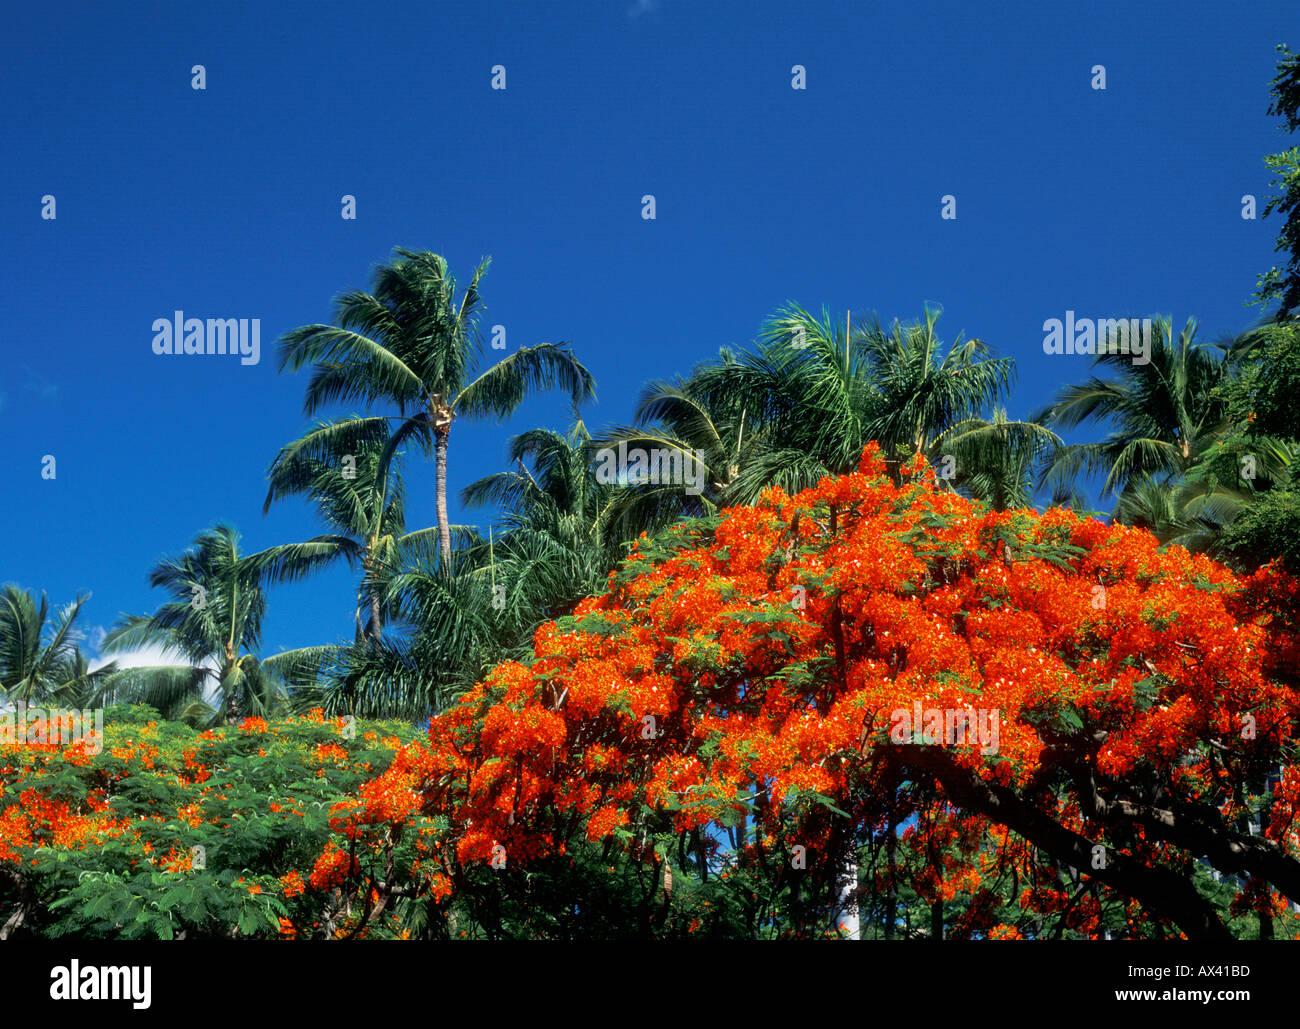 Royal Poinciana trees blooming on Maui Hawaii Stock Photo: 1720764 ...